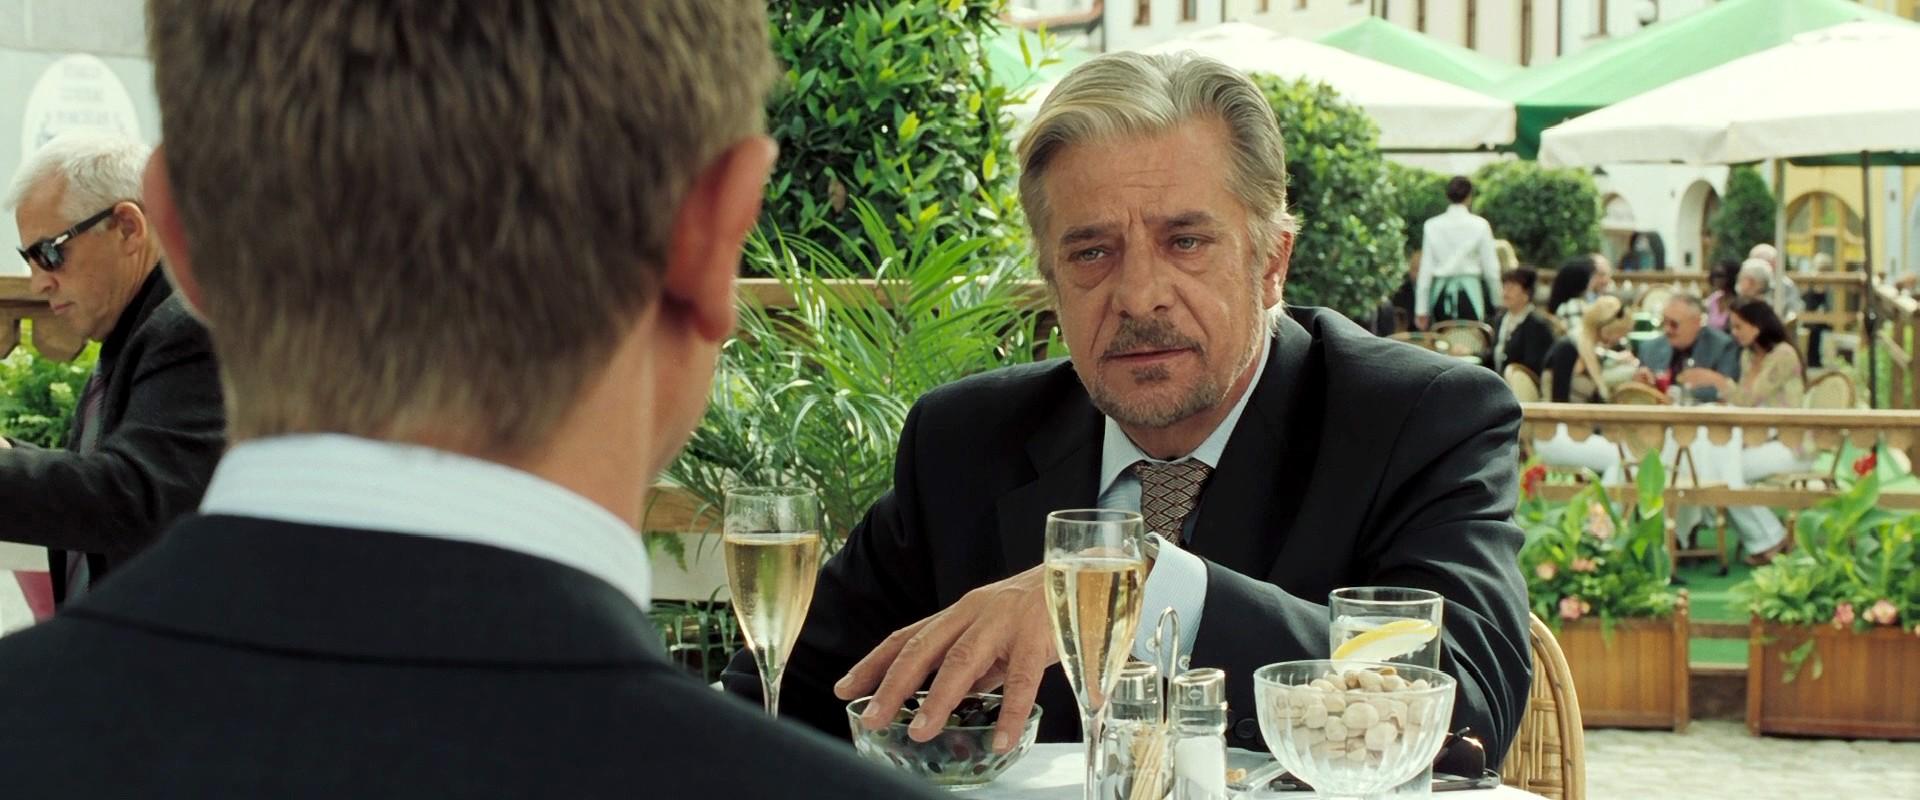 Giancarlo Giannini Screensavers